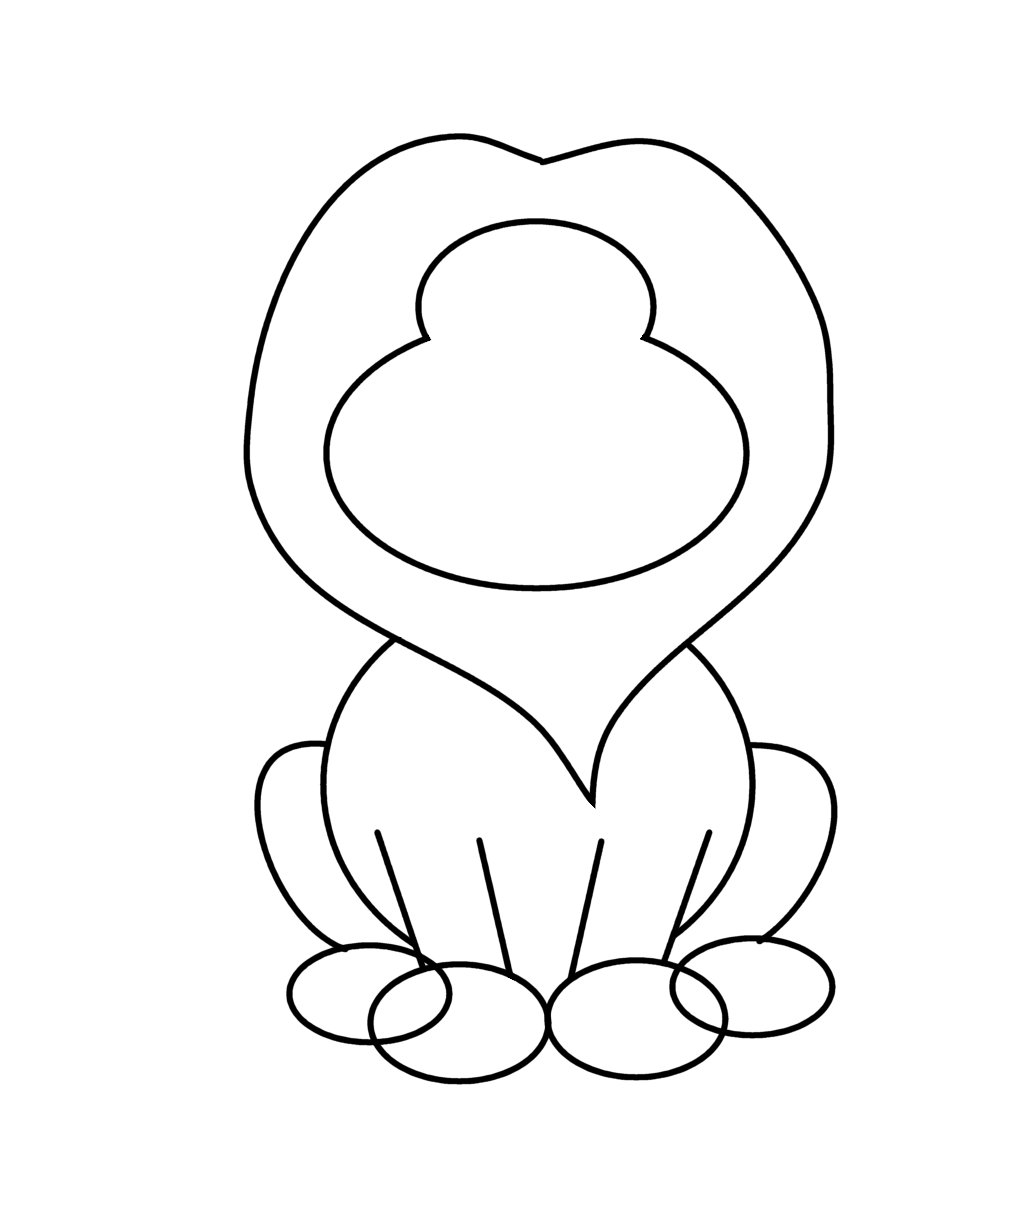 how to draw a cute cartoon lion